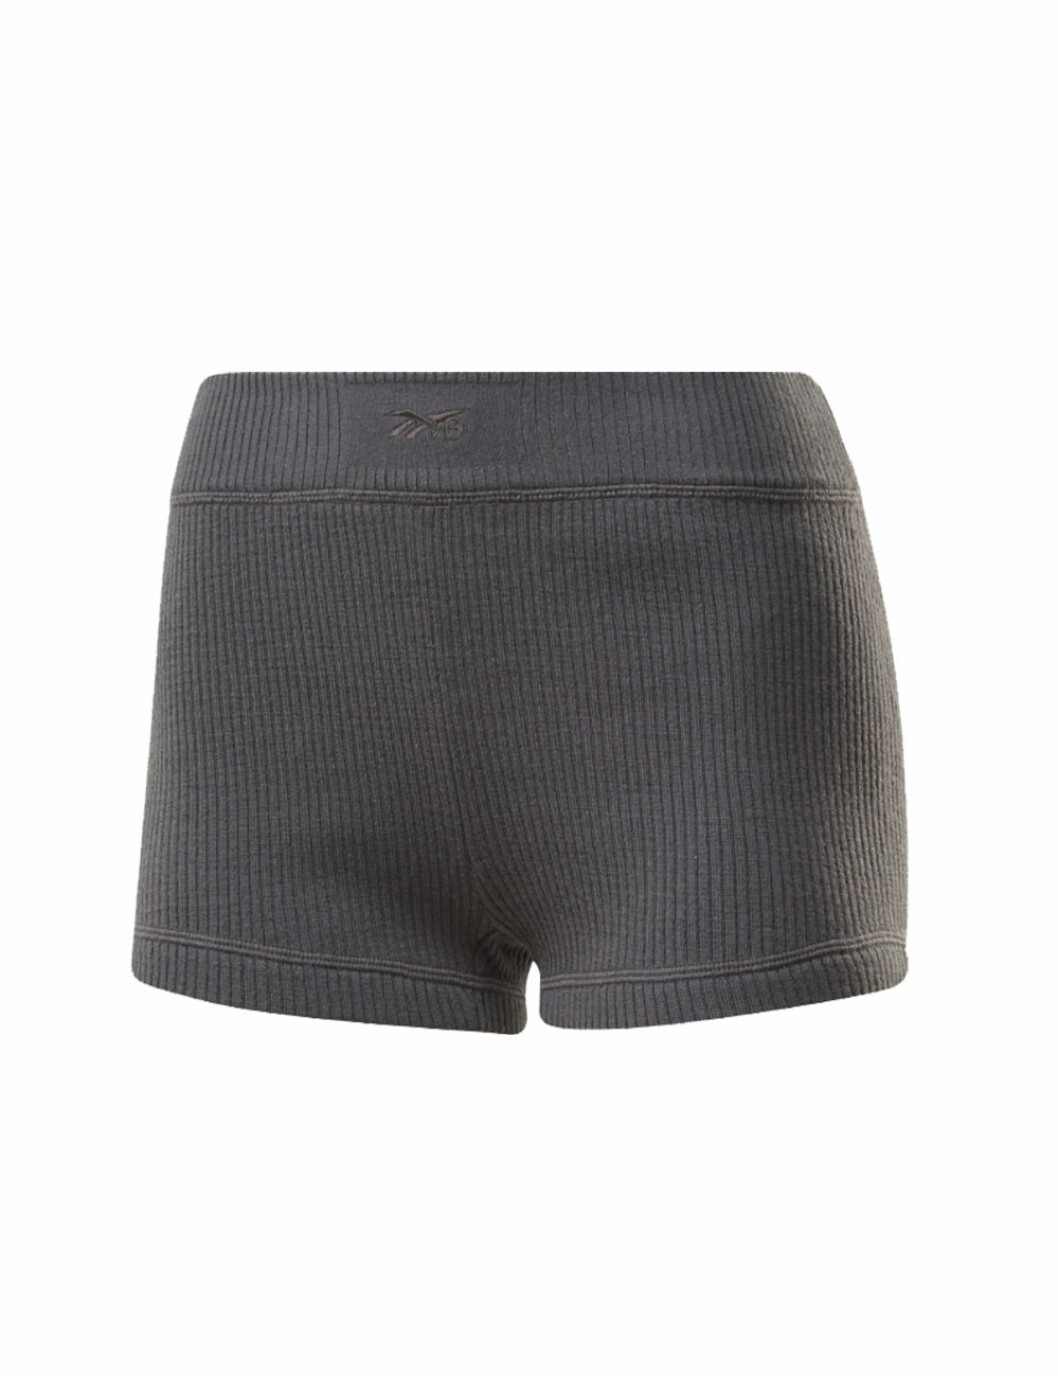 Reebok x Victoria Beckham 2020: grå ribbade shorts